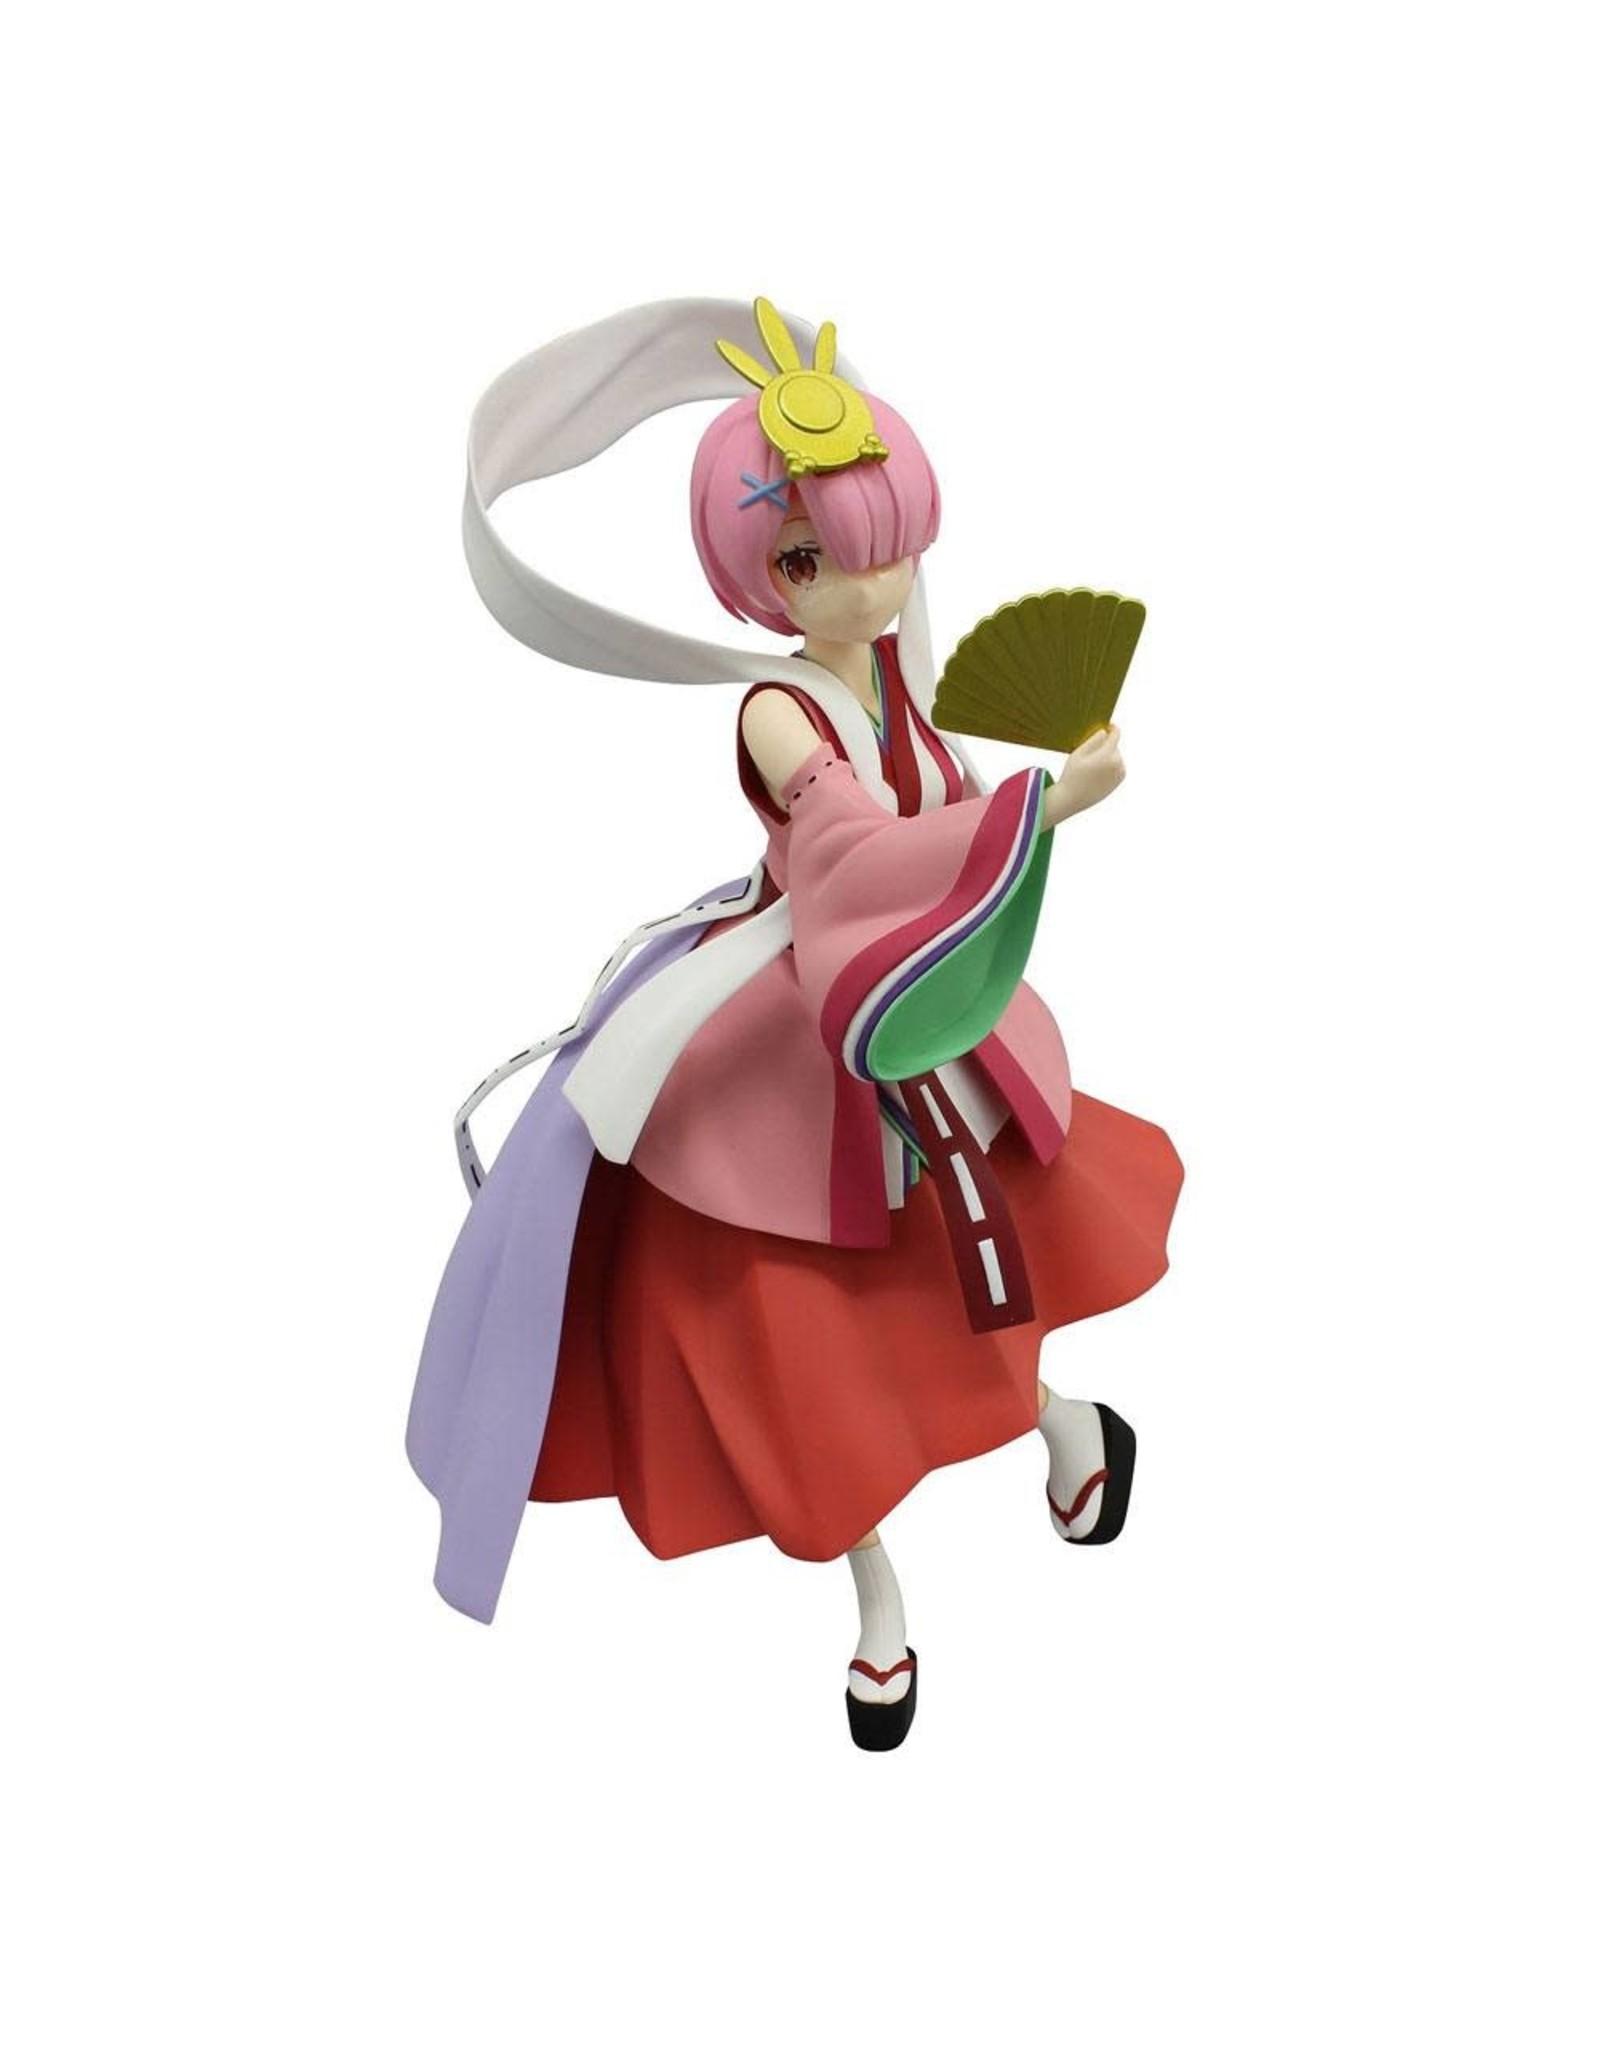 Re:ZERO - SSS PVC Figure - Fairy Tale Ram Princess Kaguya - 21 cm